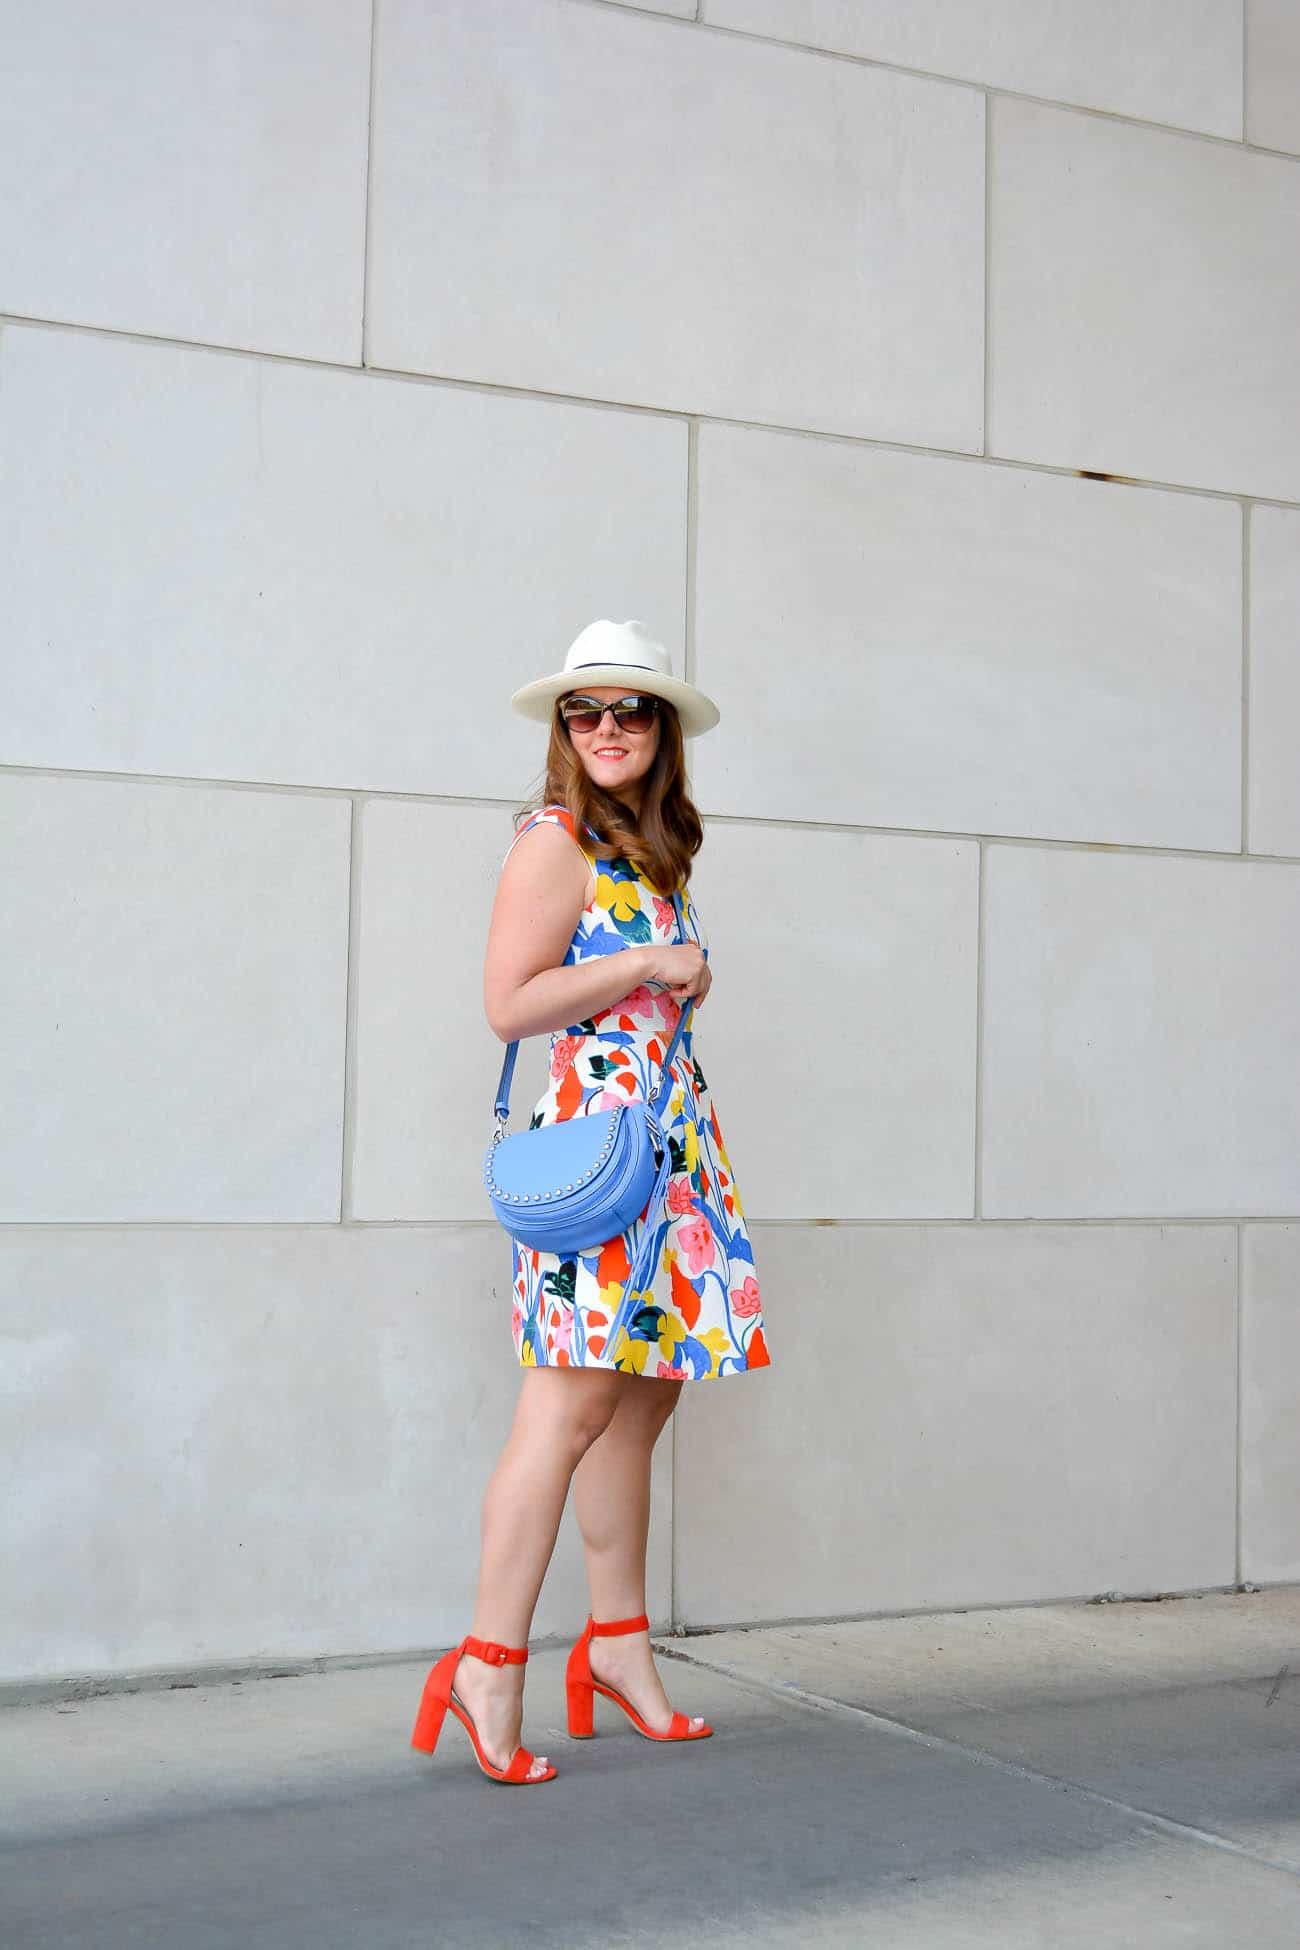 J.Crew A-Line Dress in Morning Floral, Ann Taylor Leda Block heel sandals, Rebecca Minkoff Unlined Saddle Bag, Chicago Fashion Blogger, J.Crew Fedora,